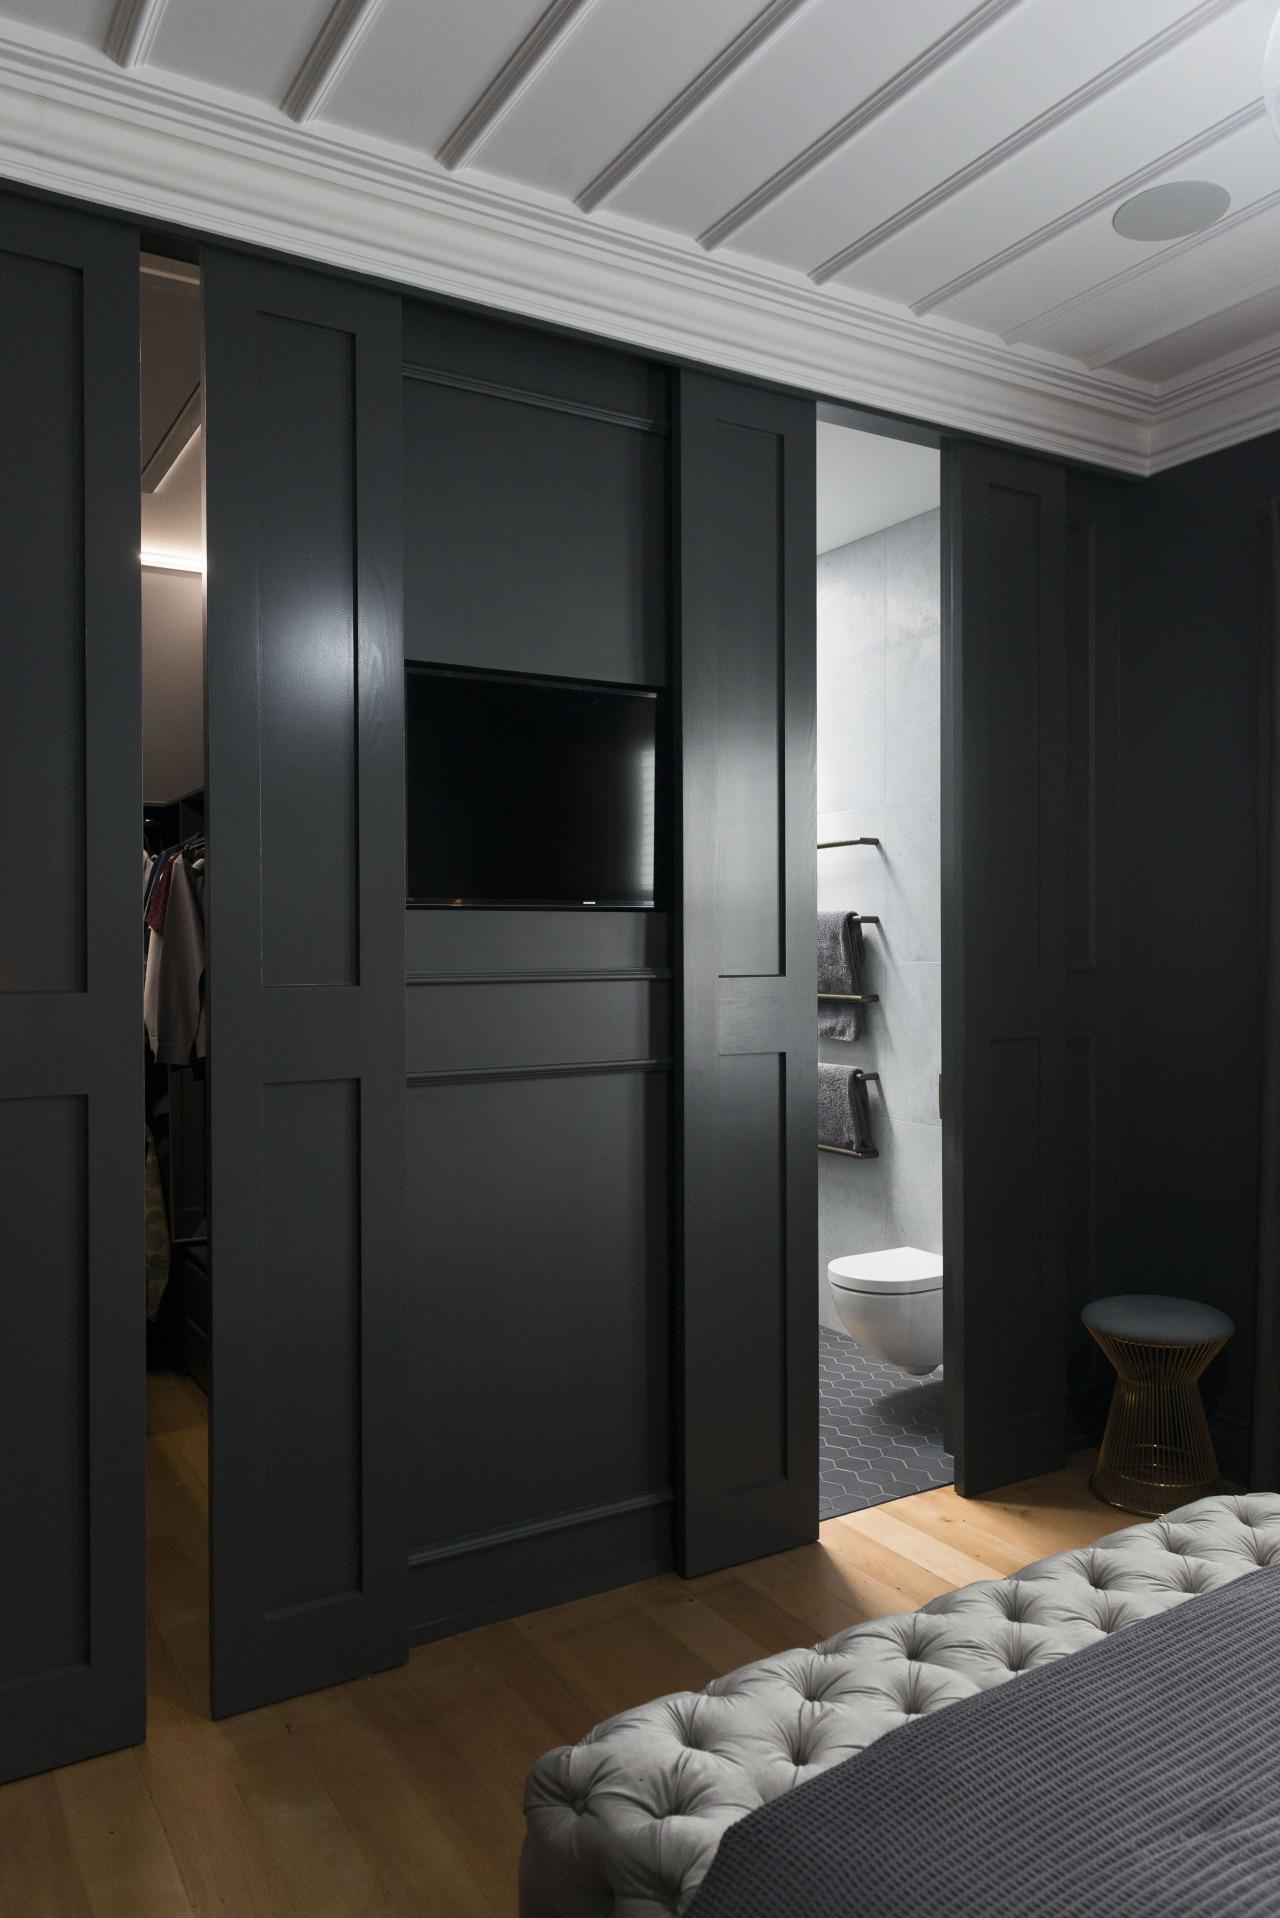 In this master suite makeover, the bedrooms custom door, furniture, interior design, room, wardrobe, black, gray